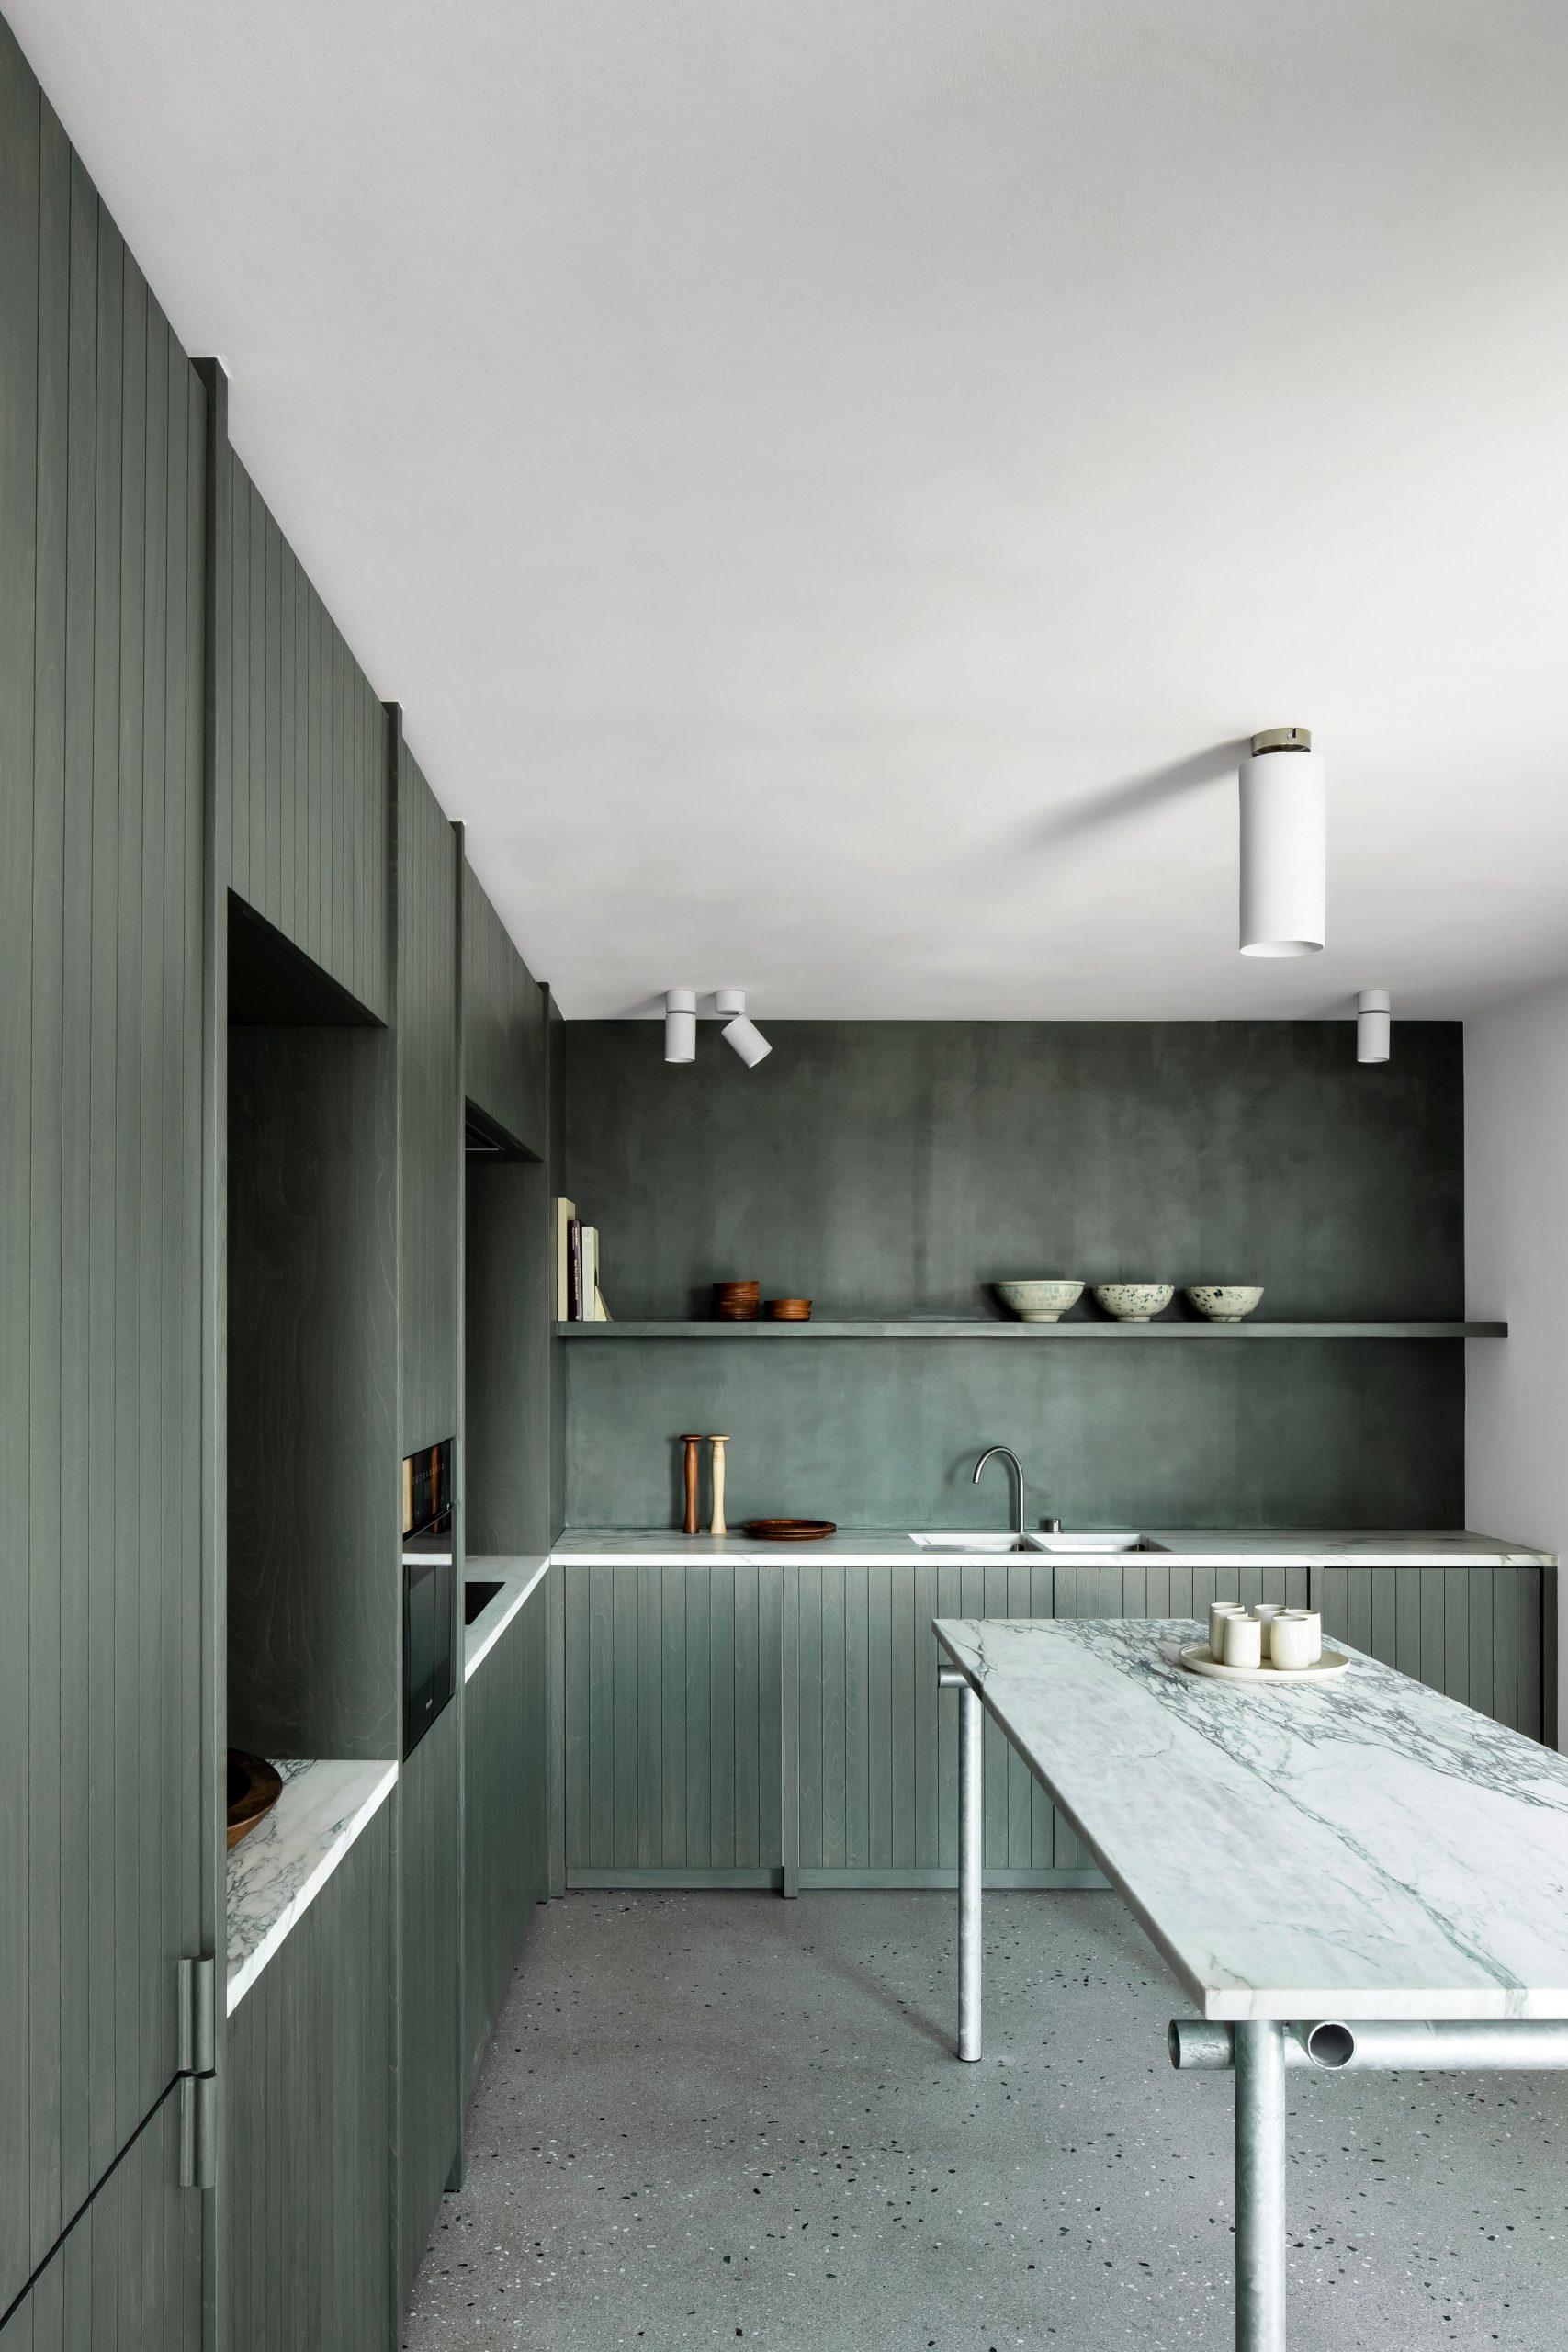 Apartment in Belgium has green birch-wood kitchen